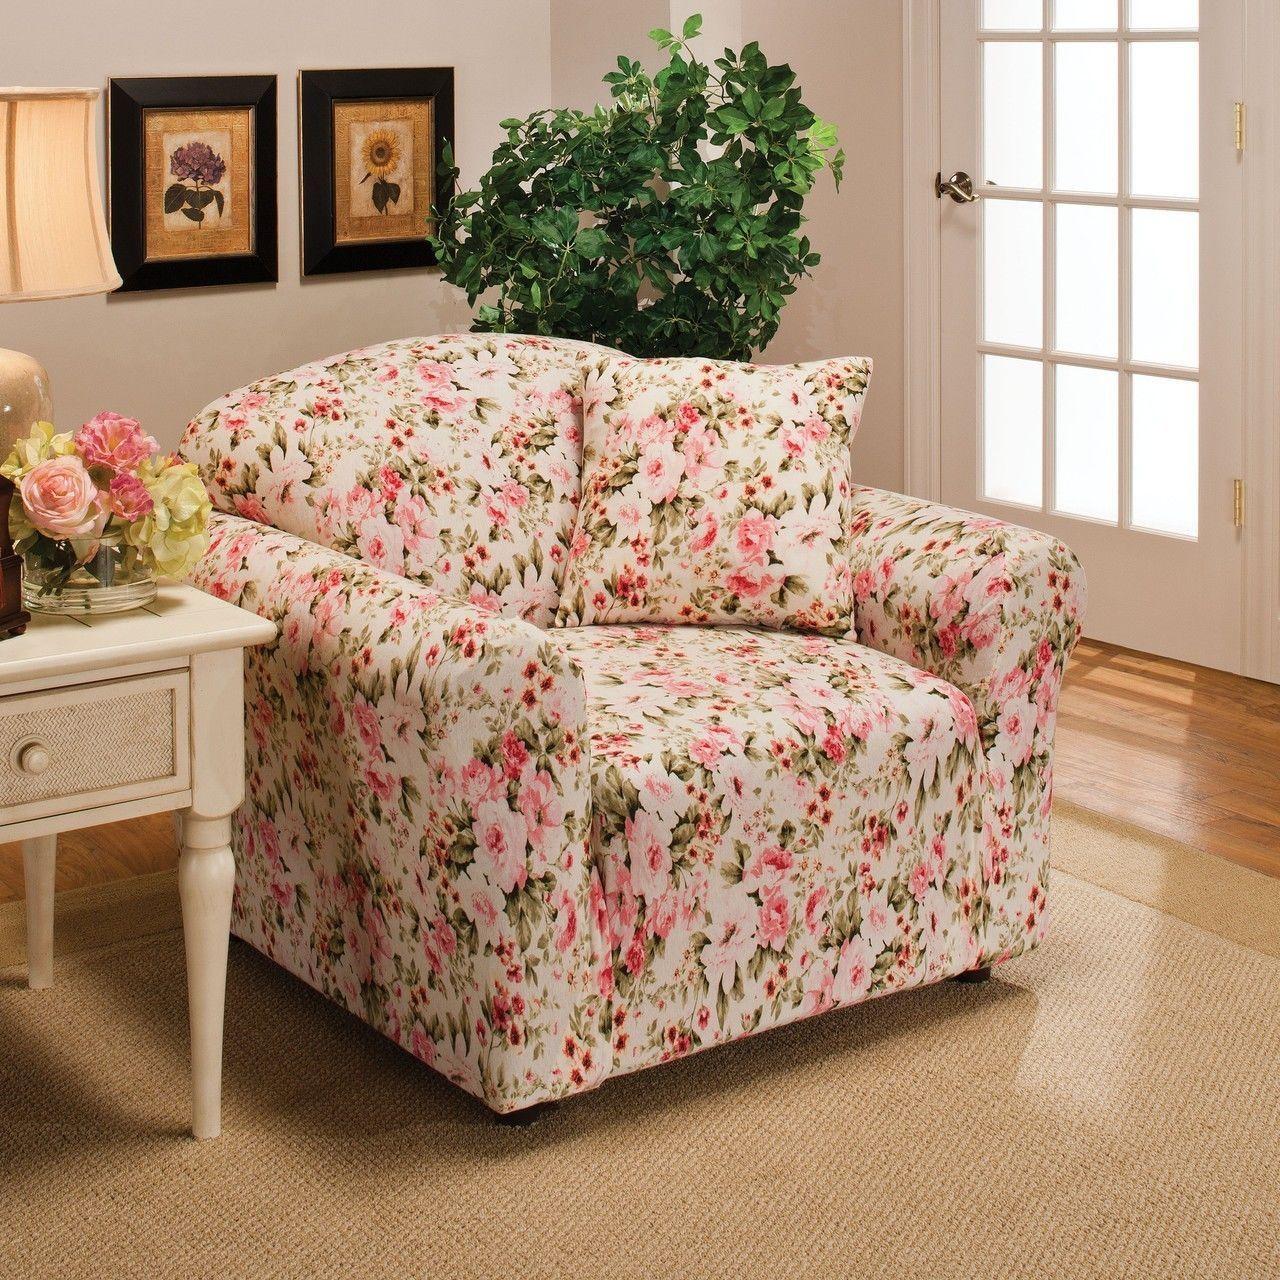 flower sofa covers sleeper mattress reviews 20 inspirations floral slipcovers ideas